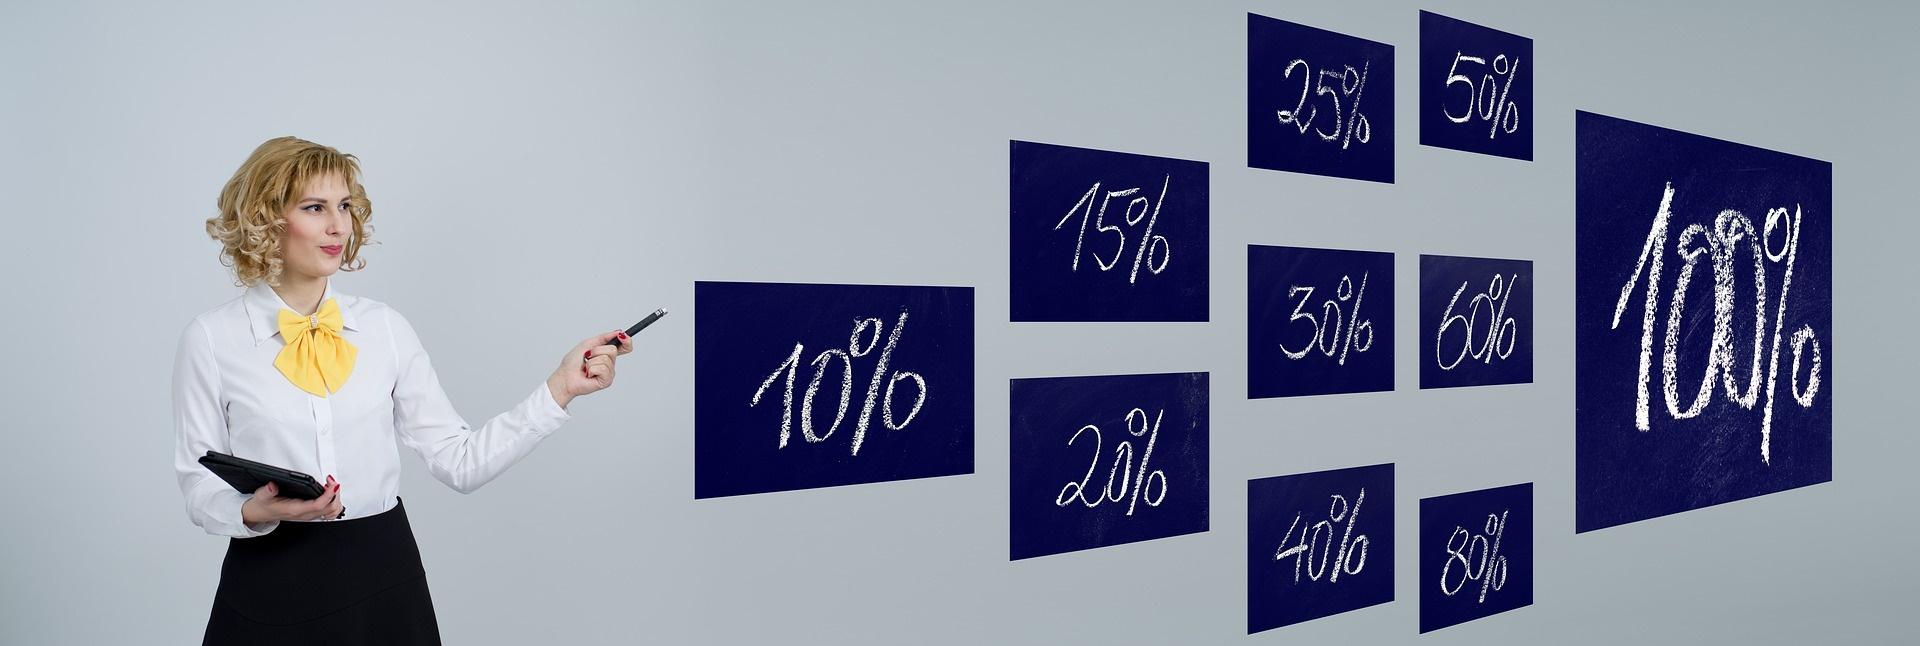 procenti business-2253639_1920